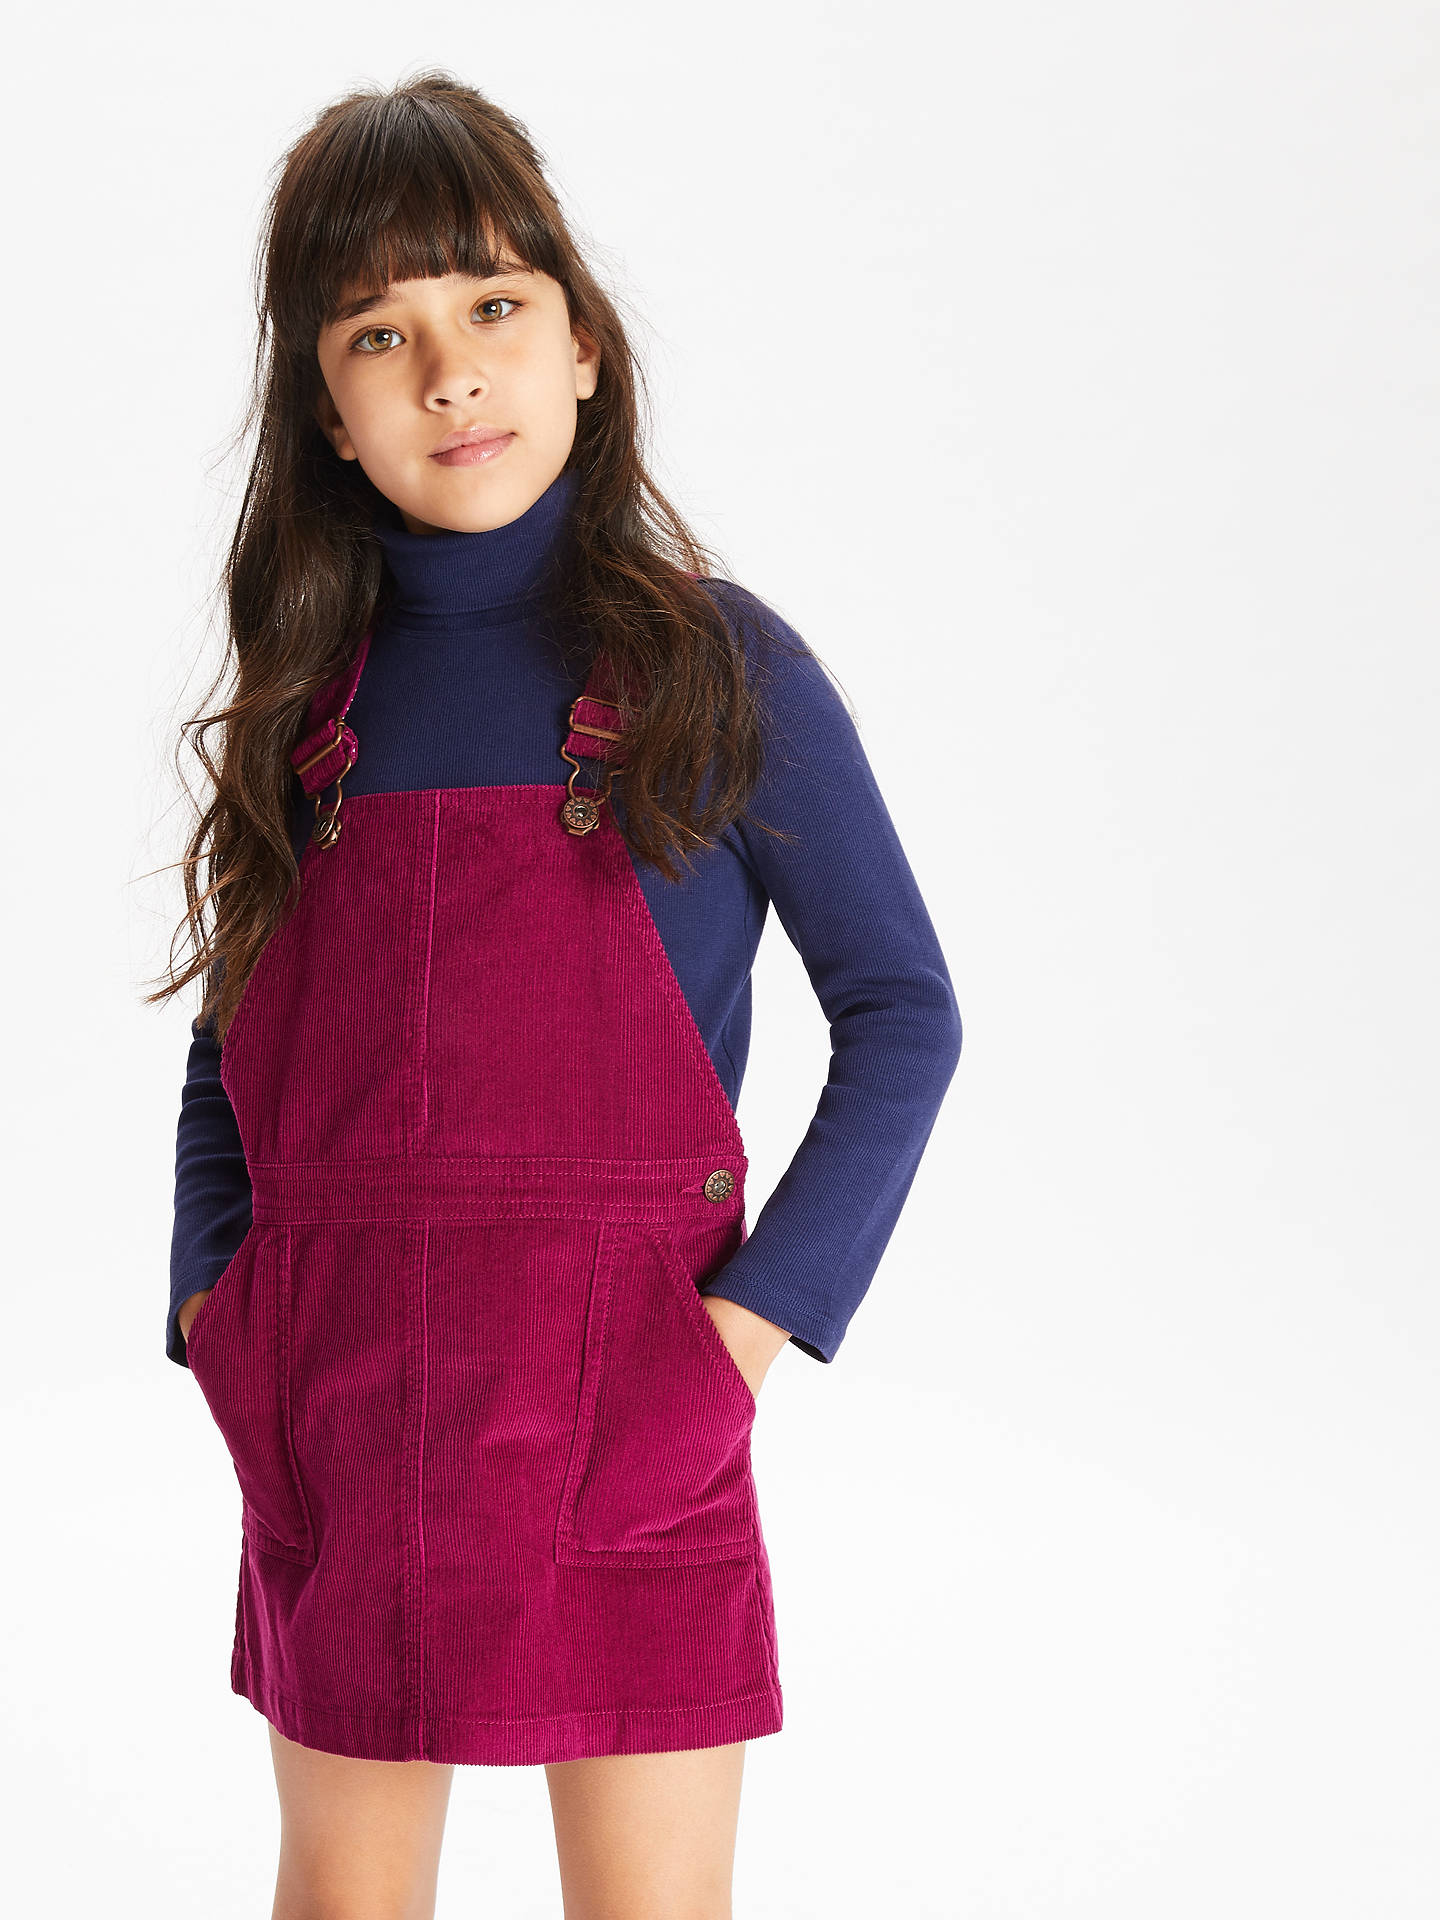 9e0a75c8f ... Buy John Lewis & Partners Girls' Corduroy Pinafore Dress, Berry, 2  years Online ...